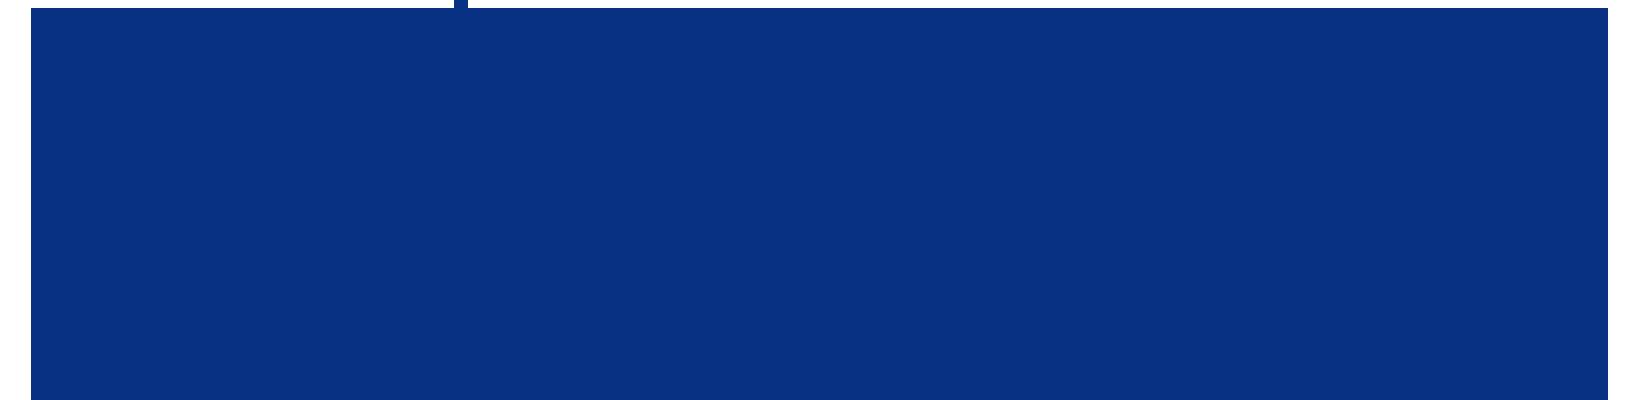 FIUSAC - Portal